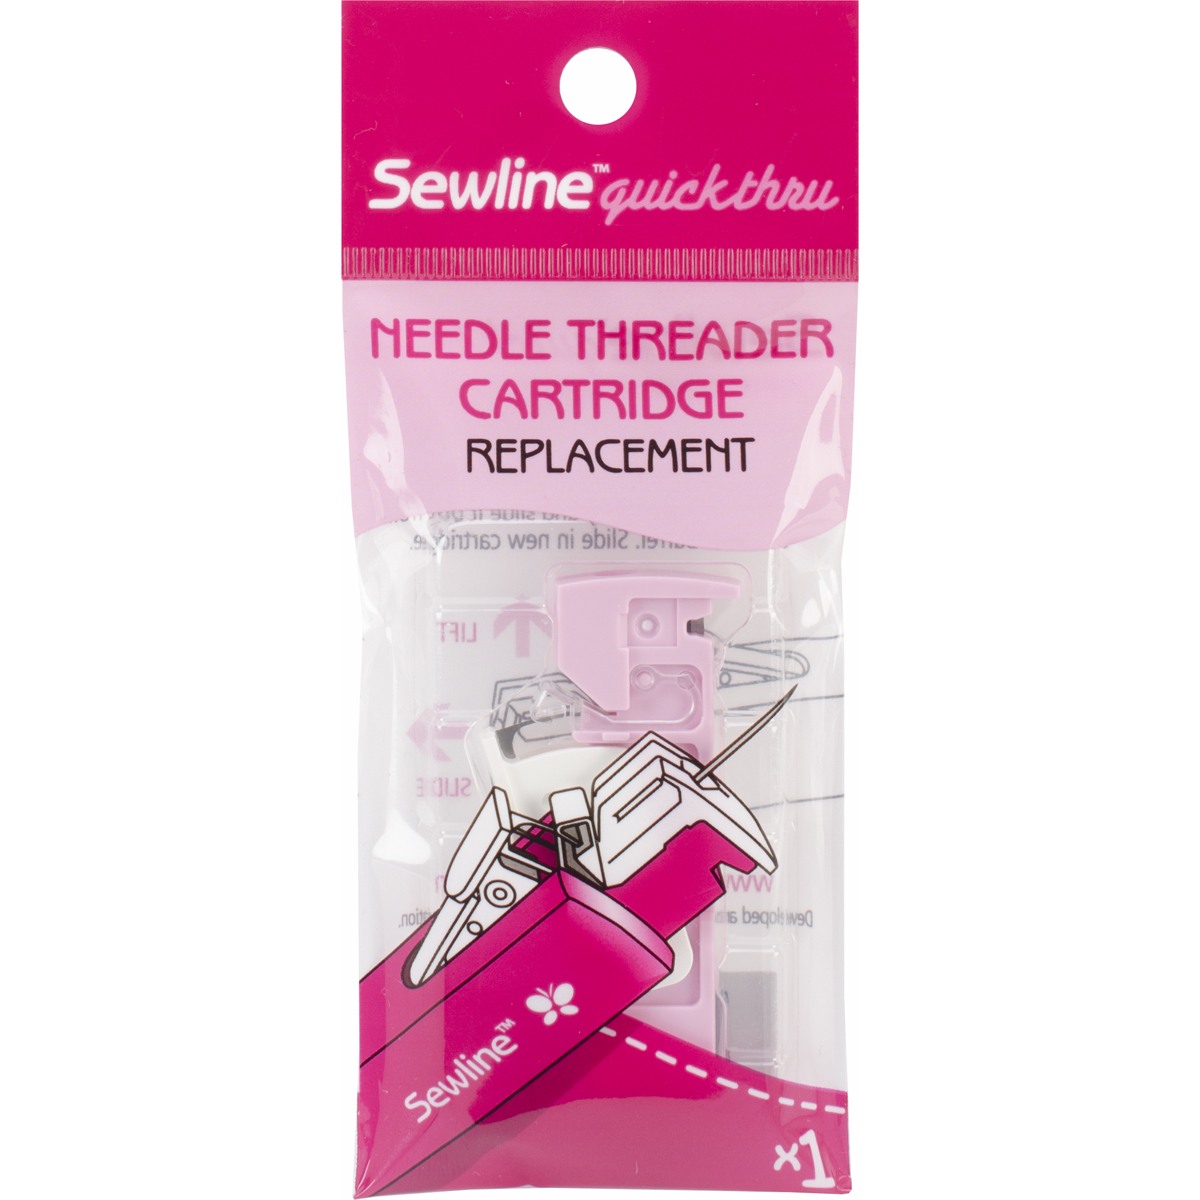 Sewline Needle Threader Cartridge Replacement-